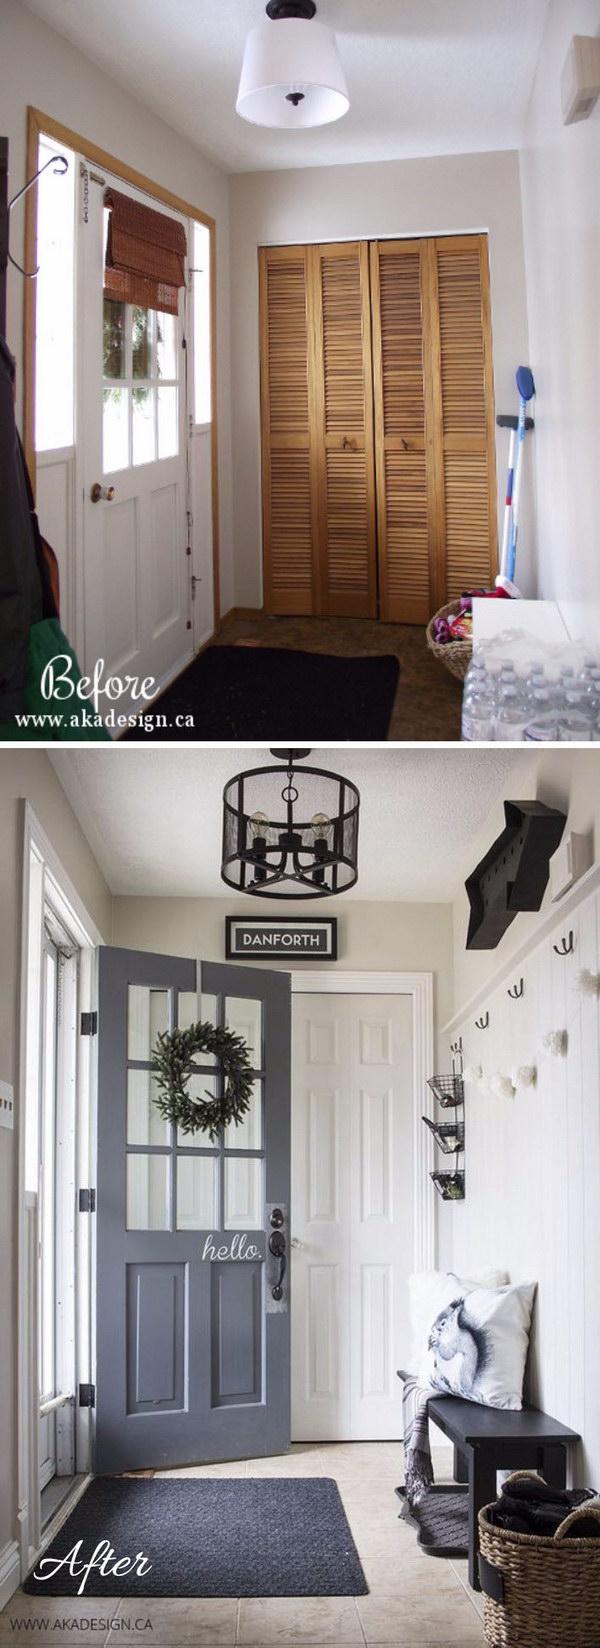 9 entryway makeover diy ideas tutorials - 30+ DIY Ideas to Give a Makeover to a Your Entryway